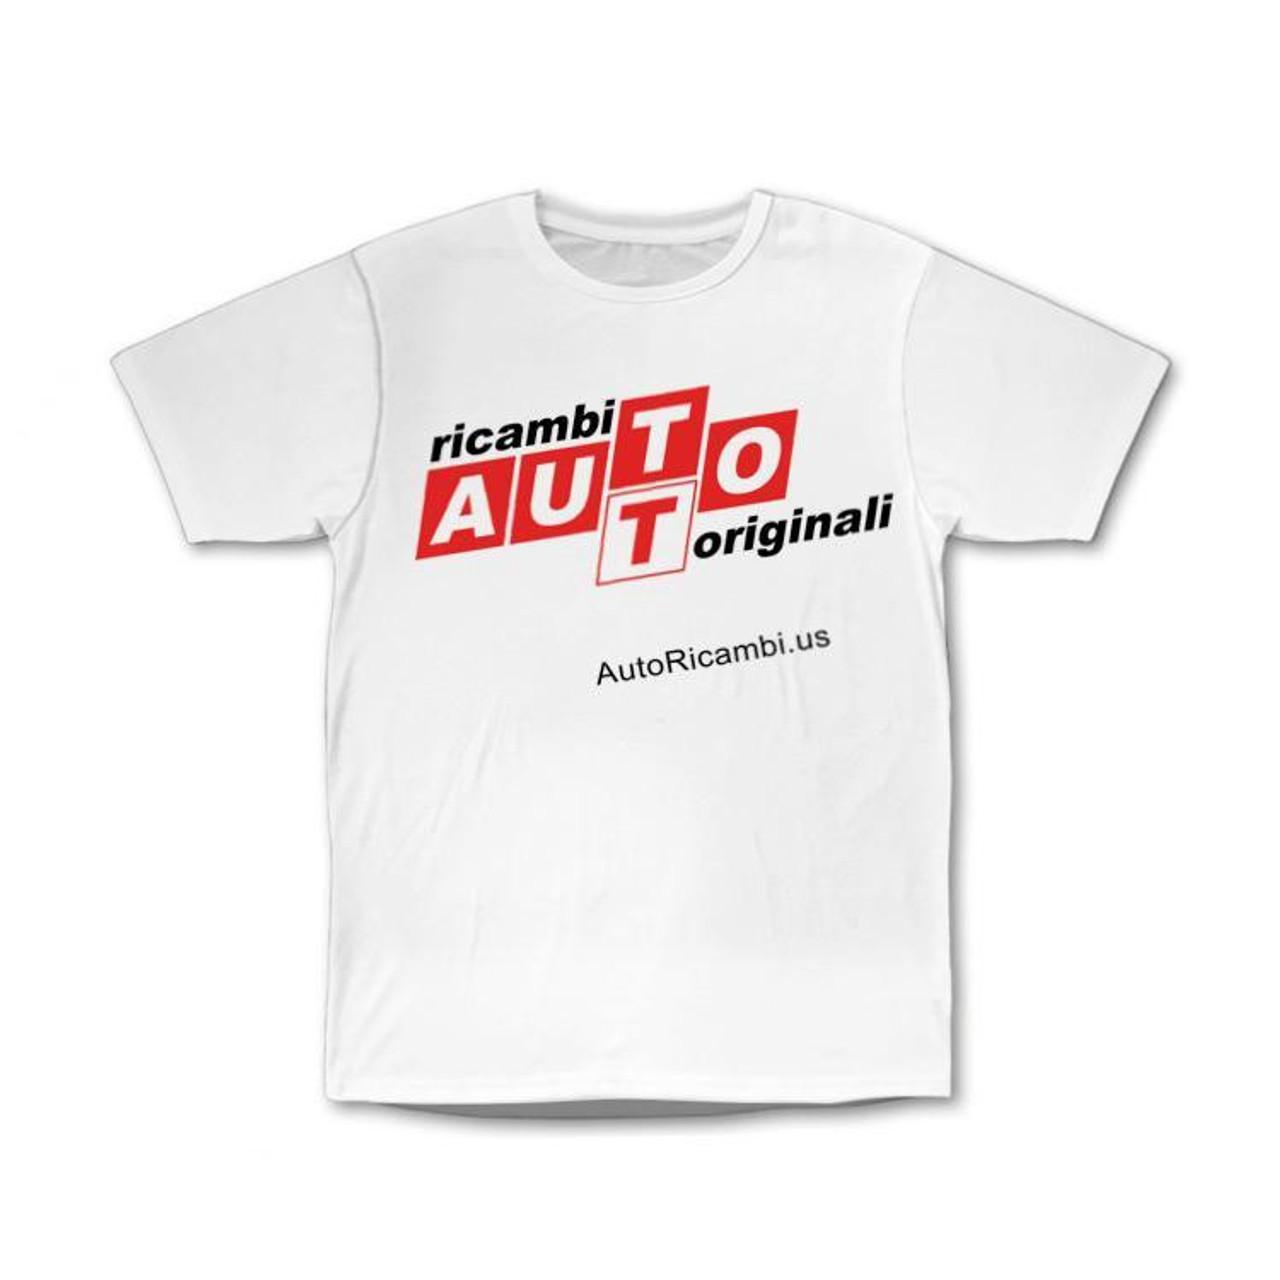 Ricambi Originali Tee Shirt - by Auto Ricambi